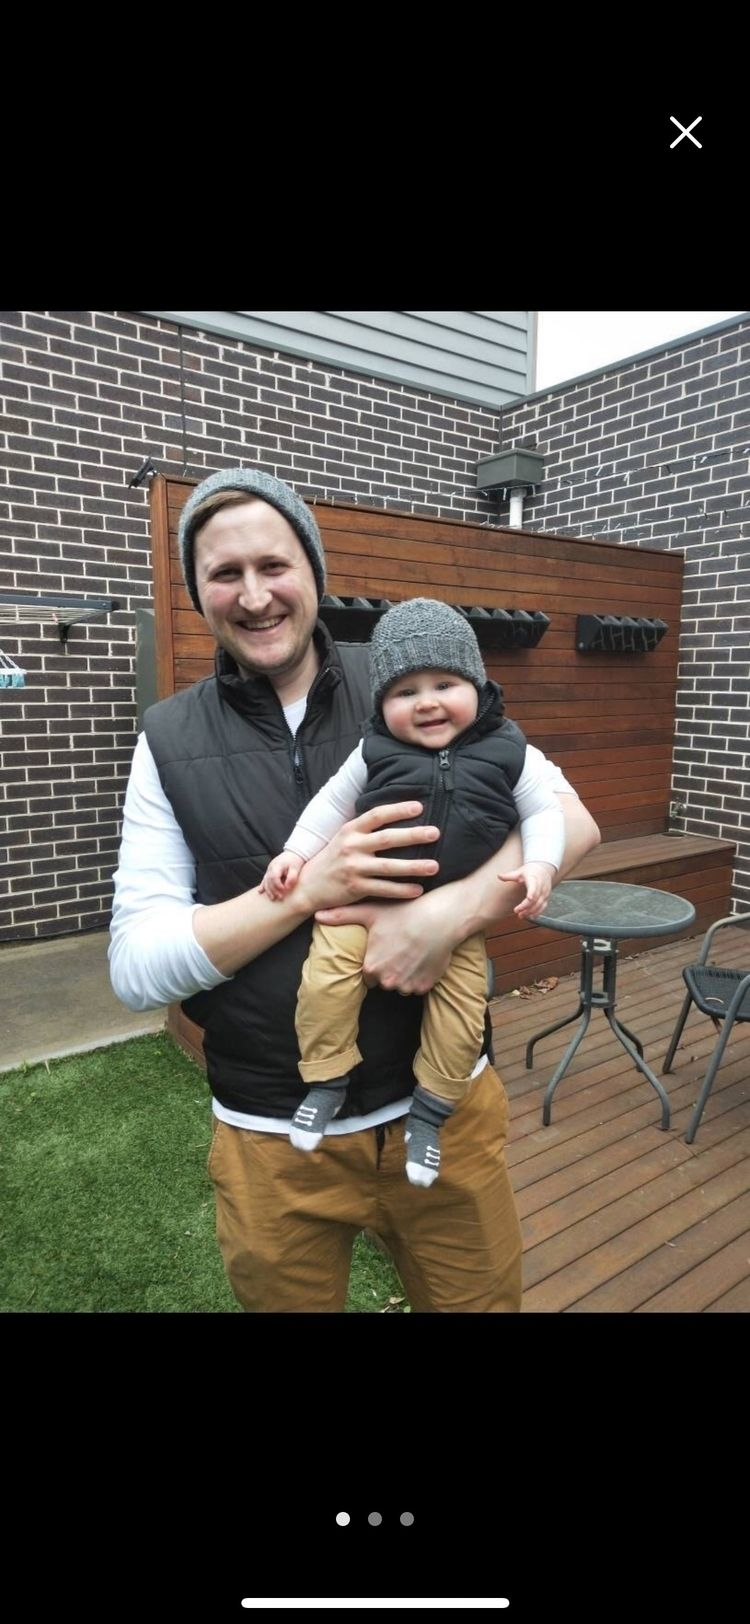 Daddy baby matching set grey wo - siennaknits   ello